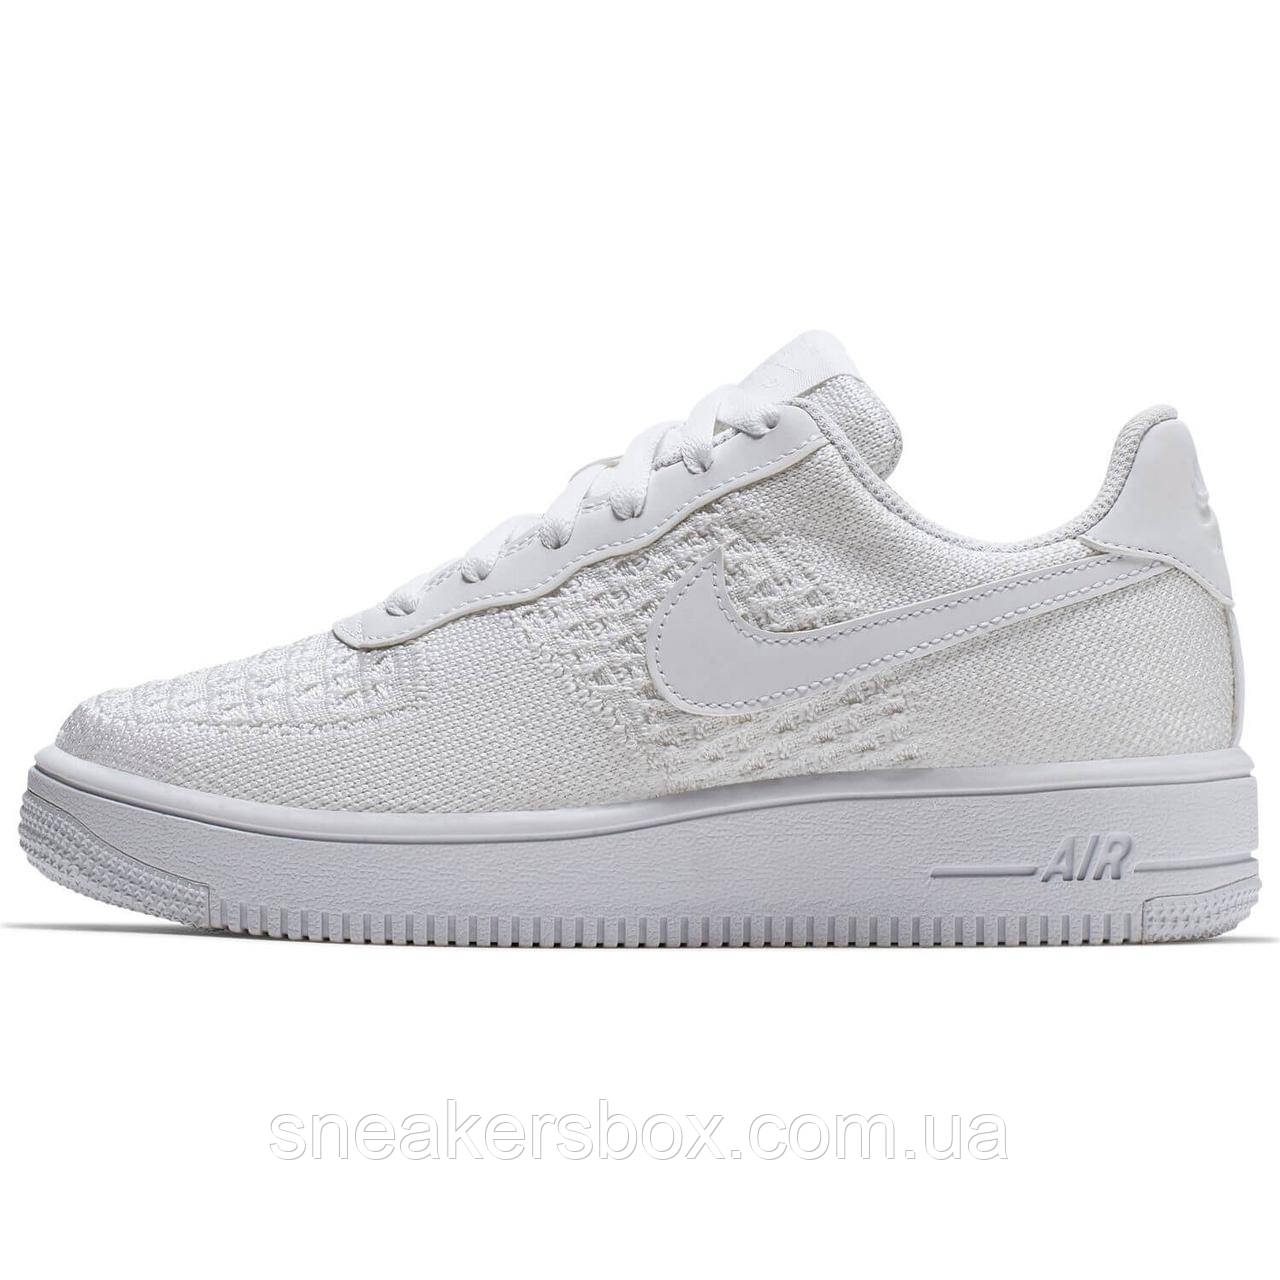 261677bd Оригинальные кроссовки Nike Air Force 1 Flyknit 2.0 (GS) (BV0063-100 ...